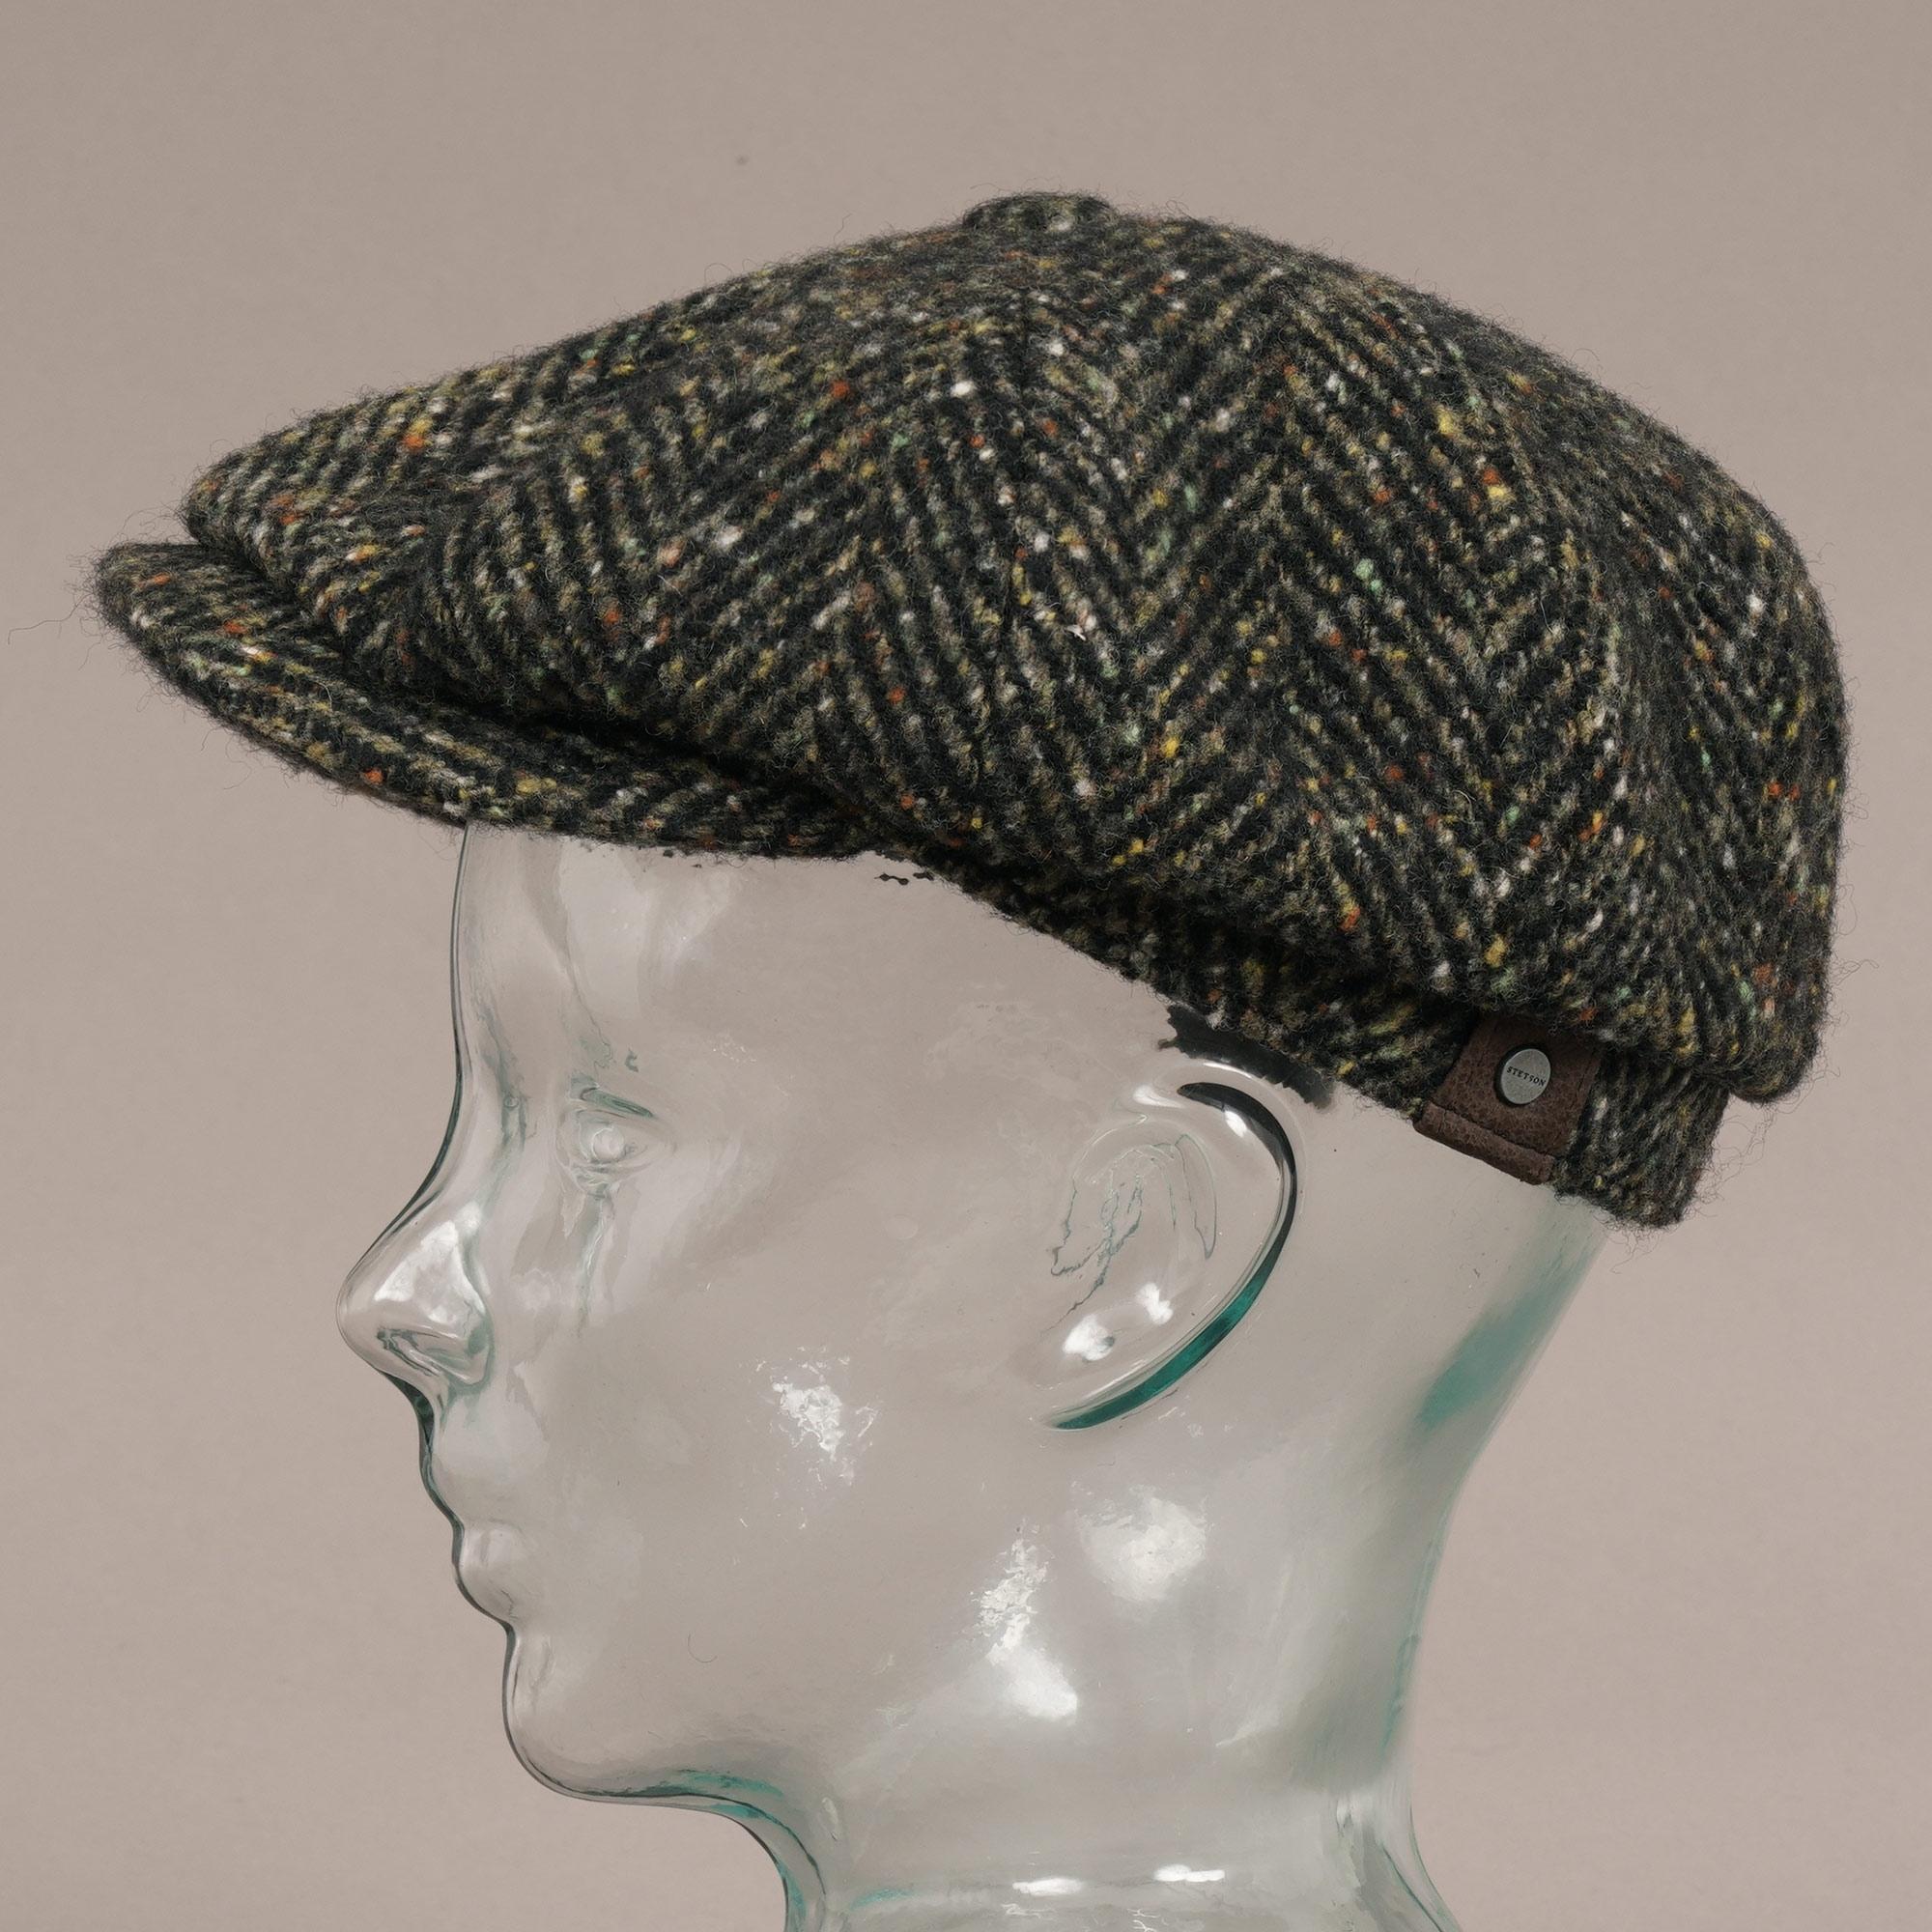 7a53c9e0c8d Hatteras Wool Bakerboy Cap - Black Multi